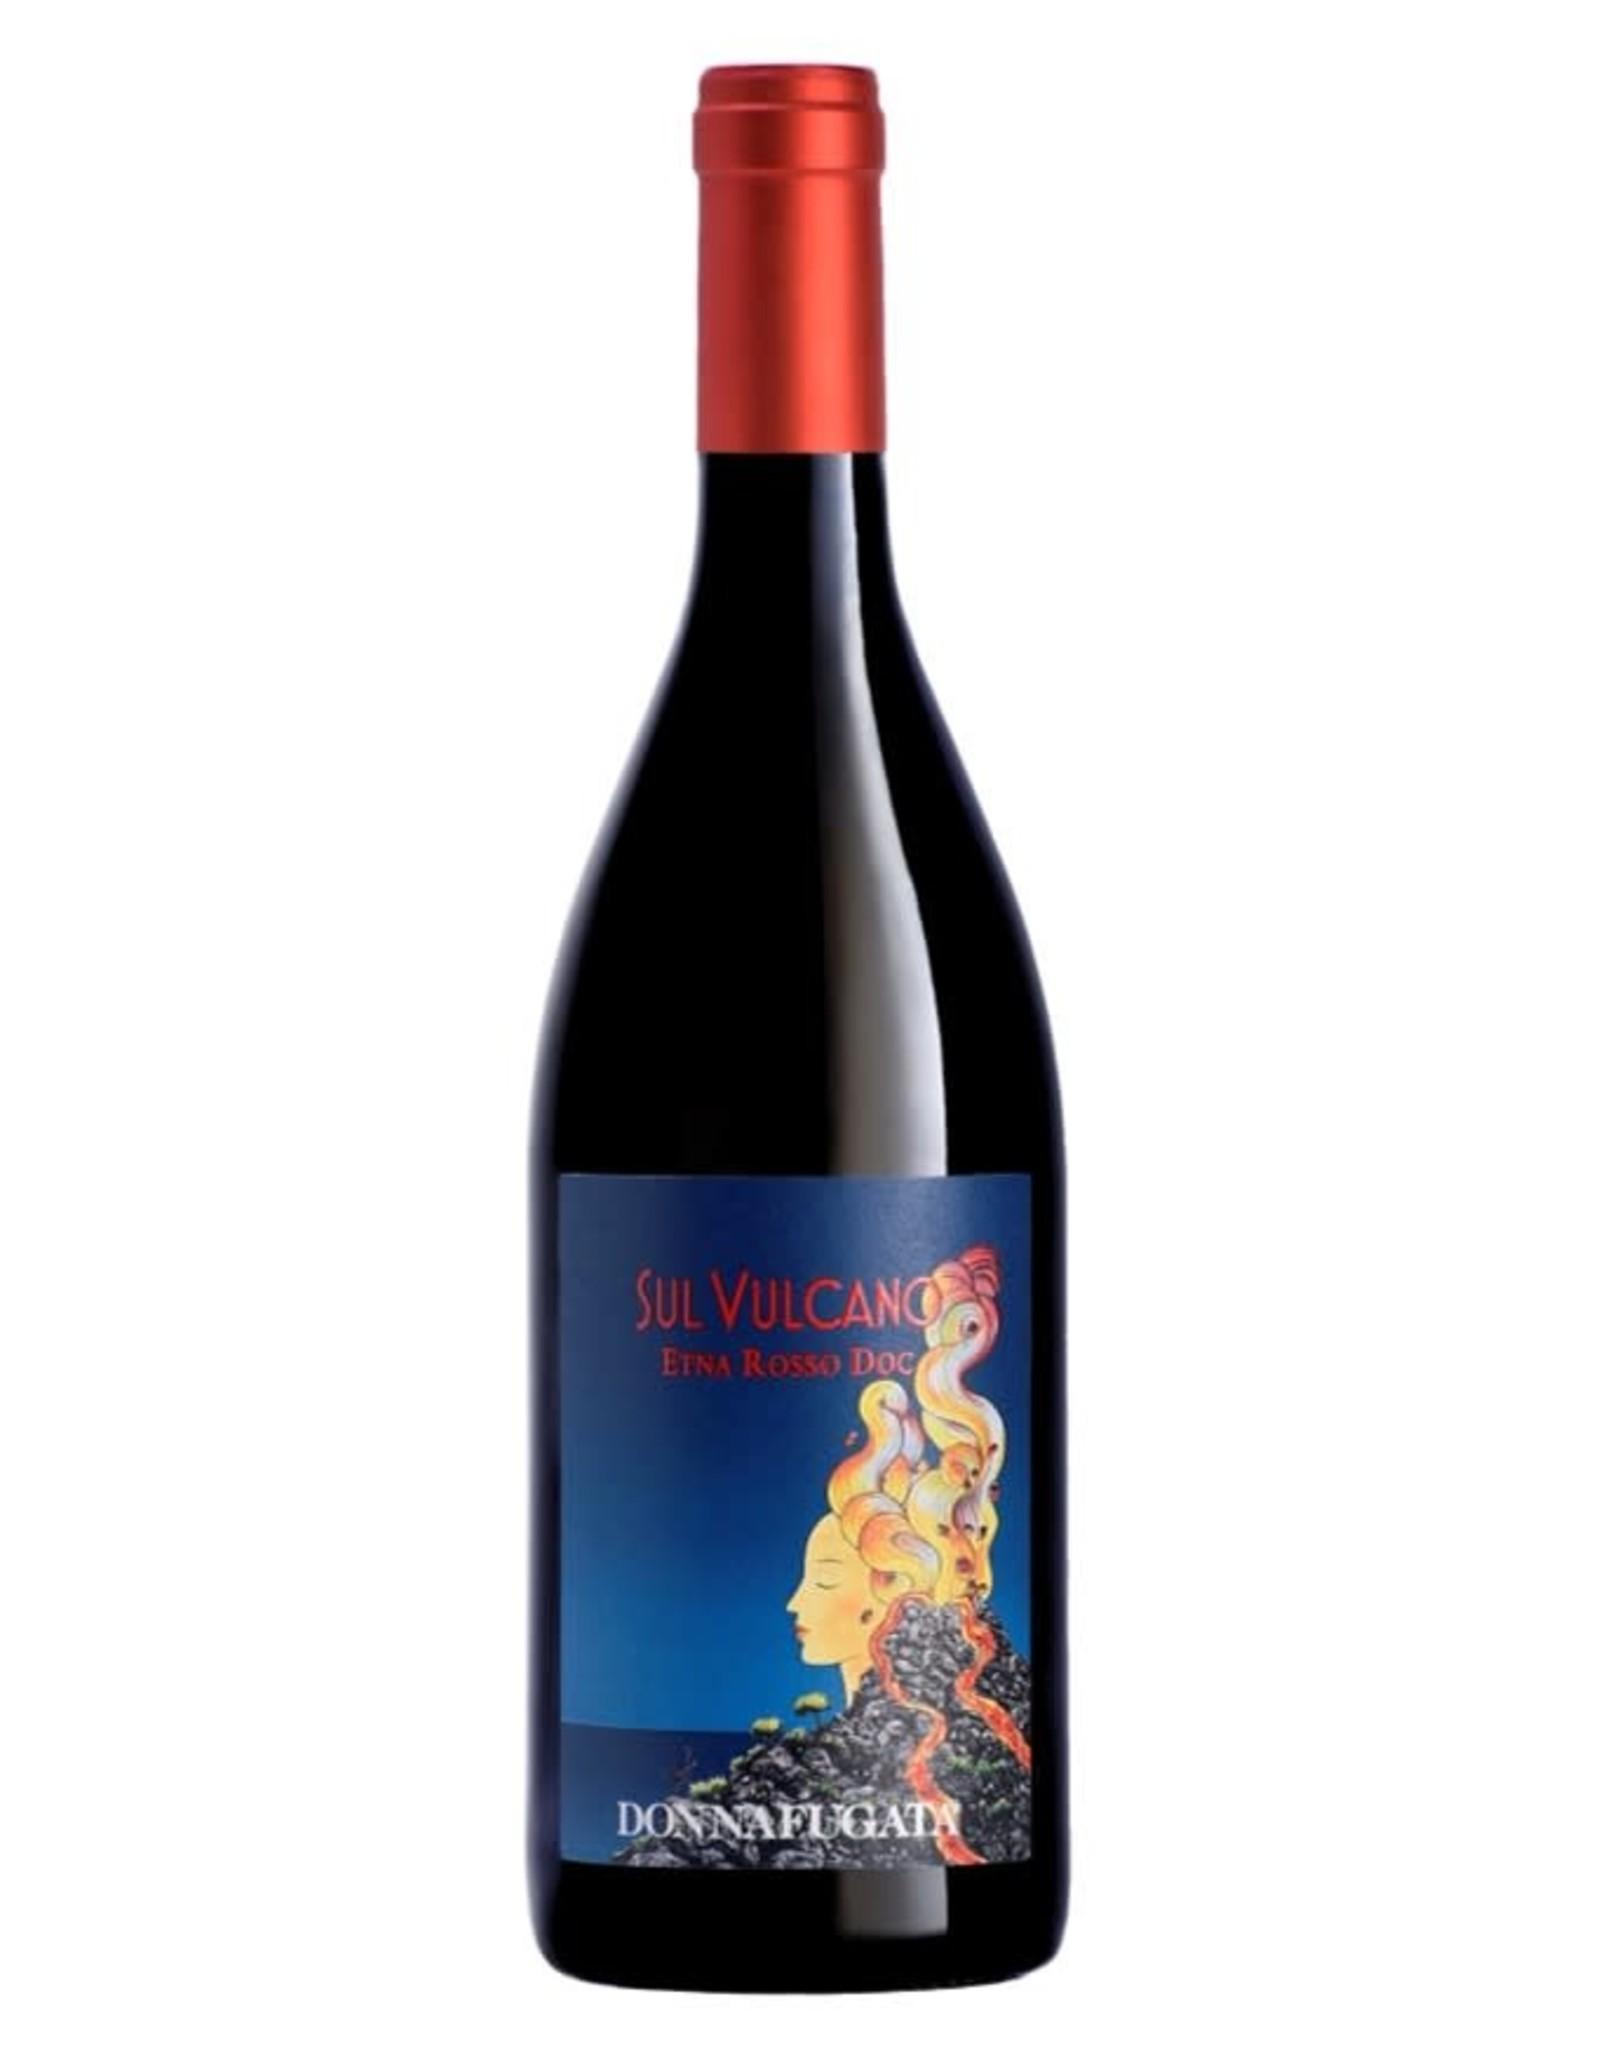 Donnafugata Etna Rosso Sul Vulcano 2016